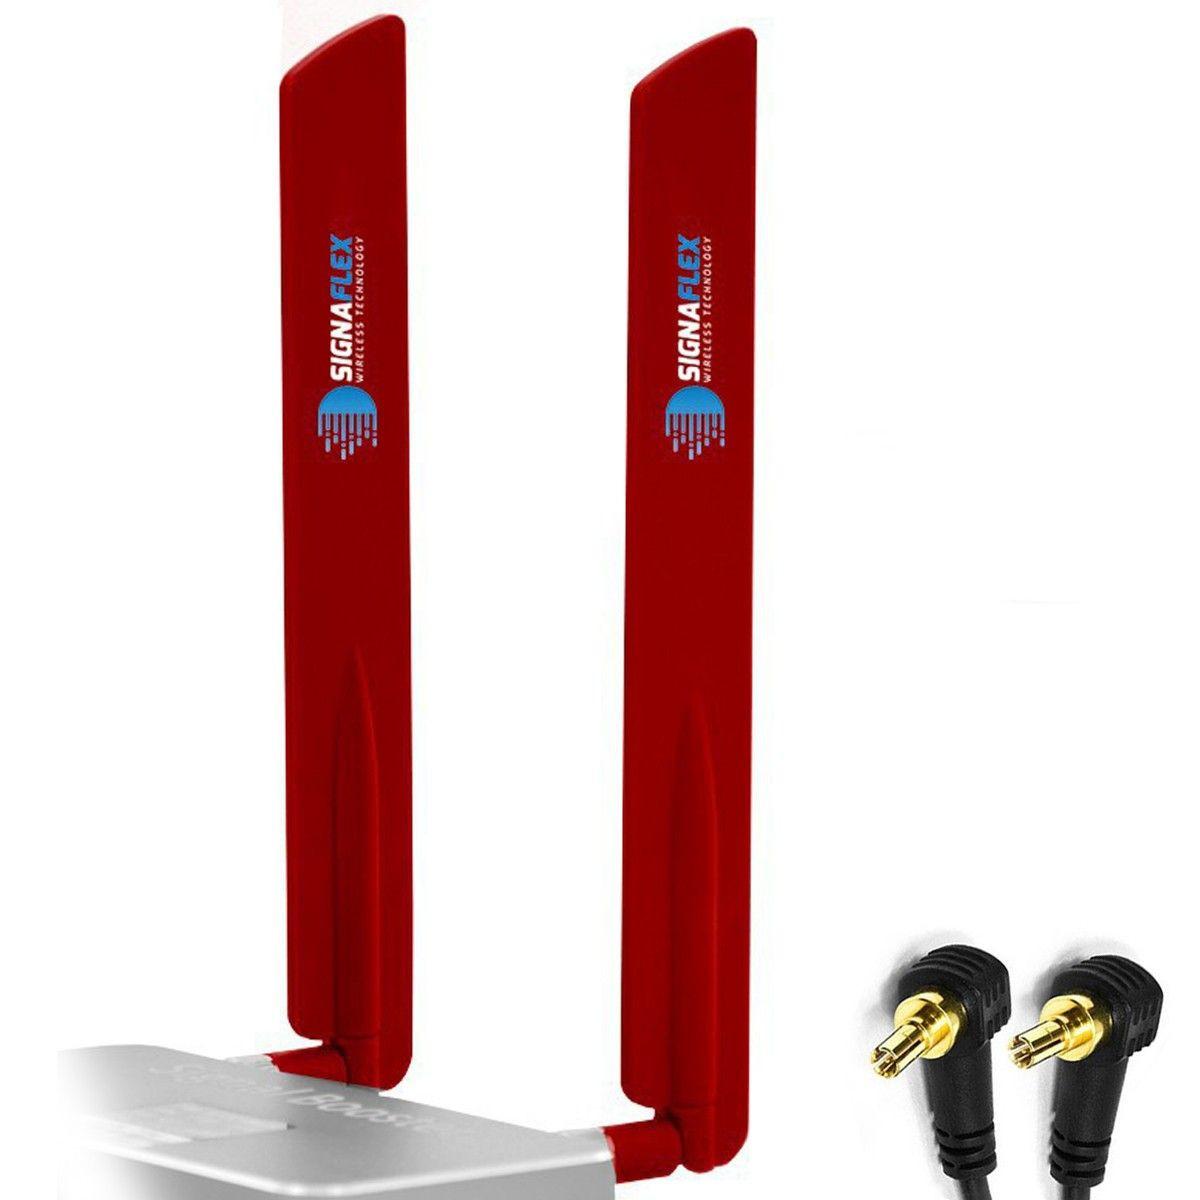 2 x  Antena bat 4G LTE red 15dbi + CRC9